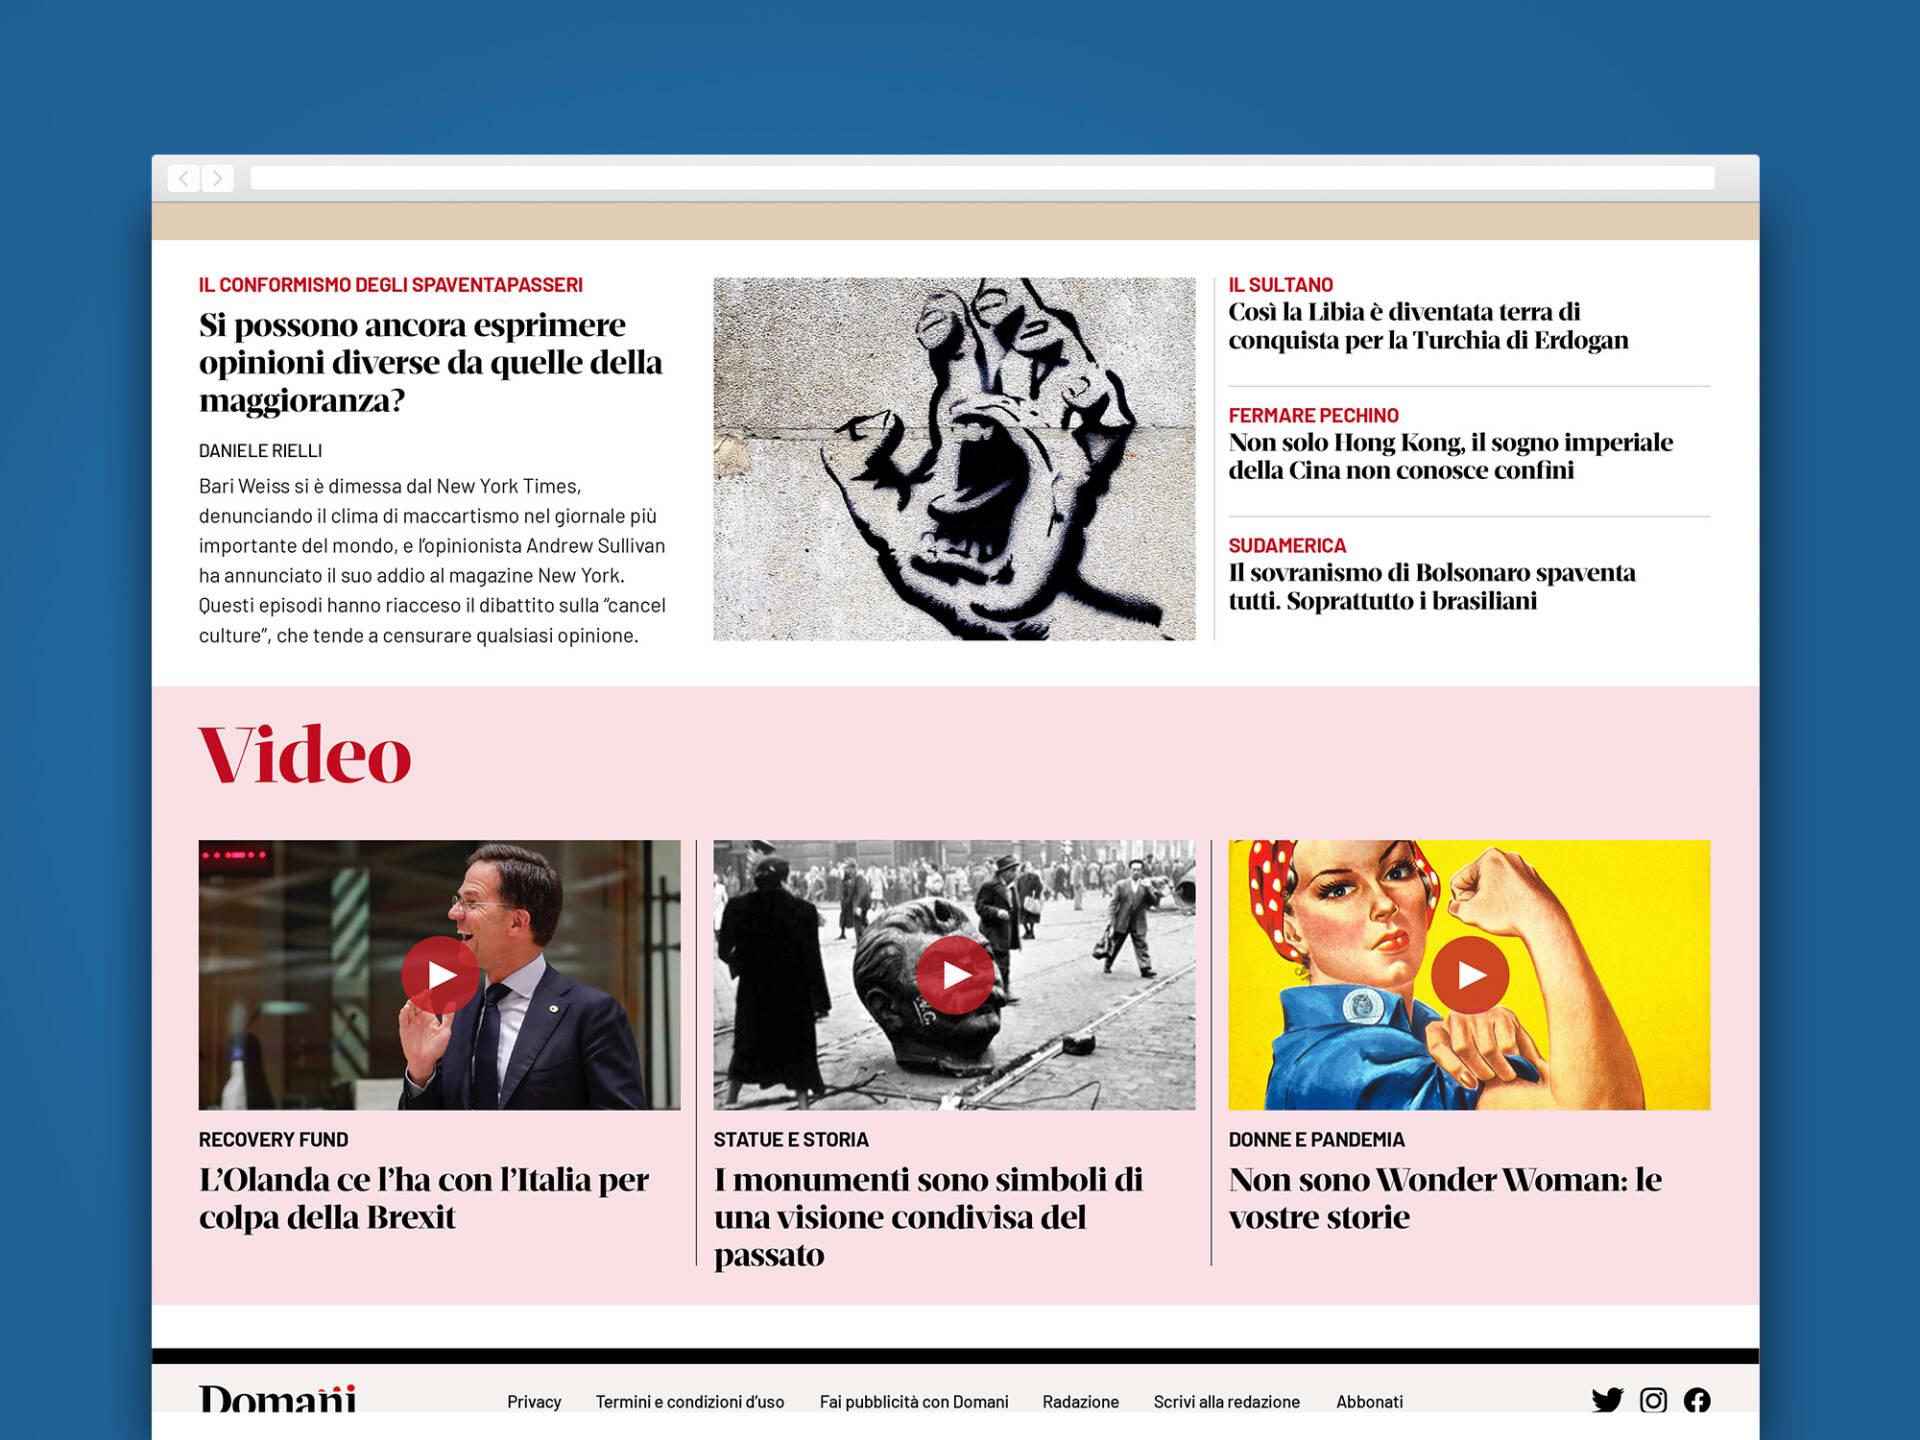 Domani_Web_Wenceslau_News_Design_5b